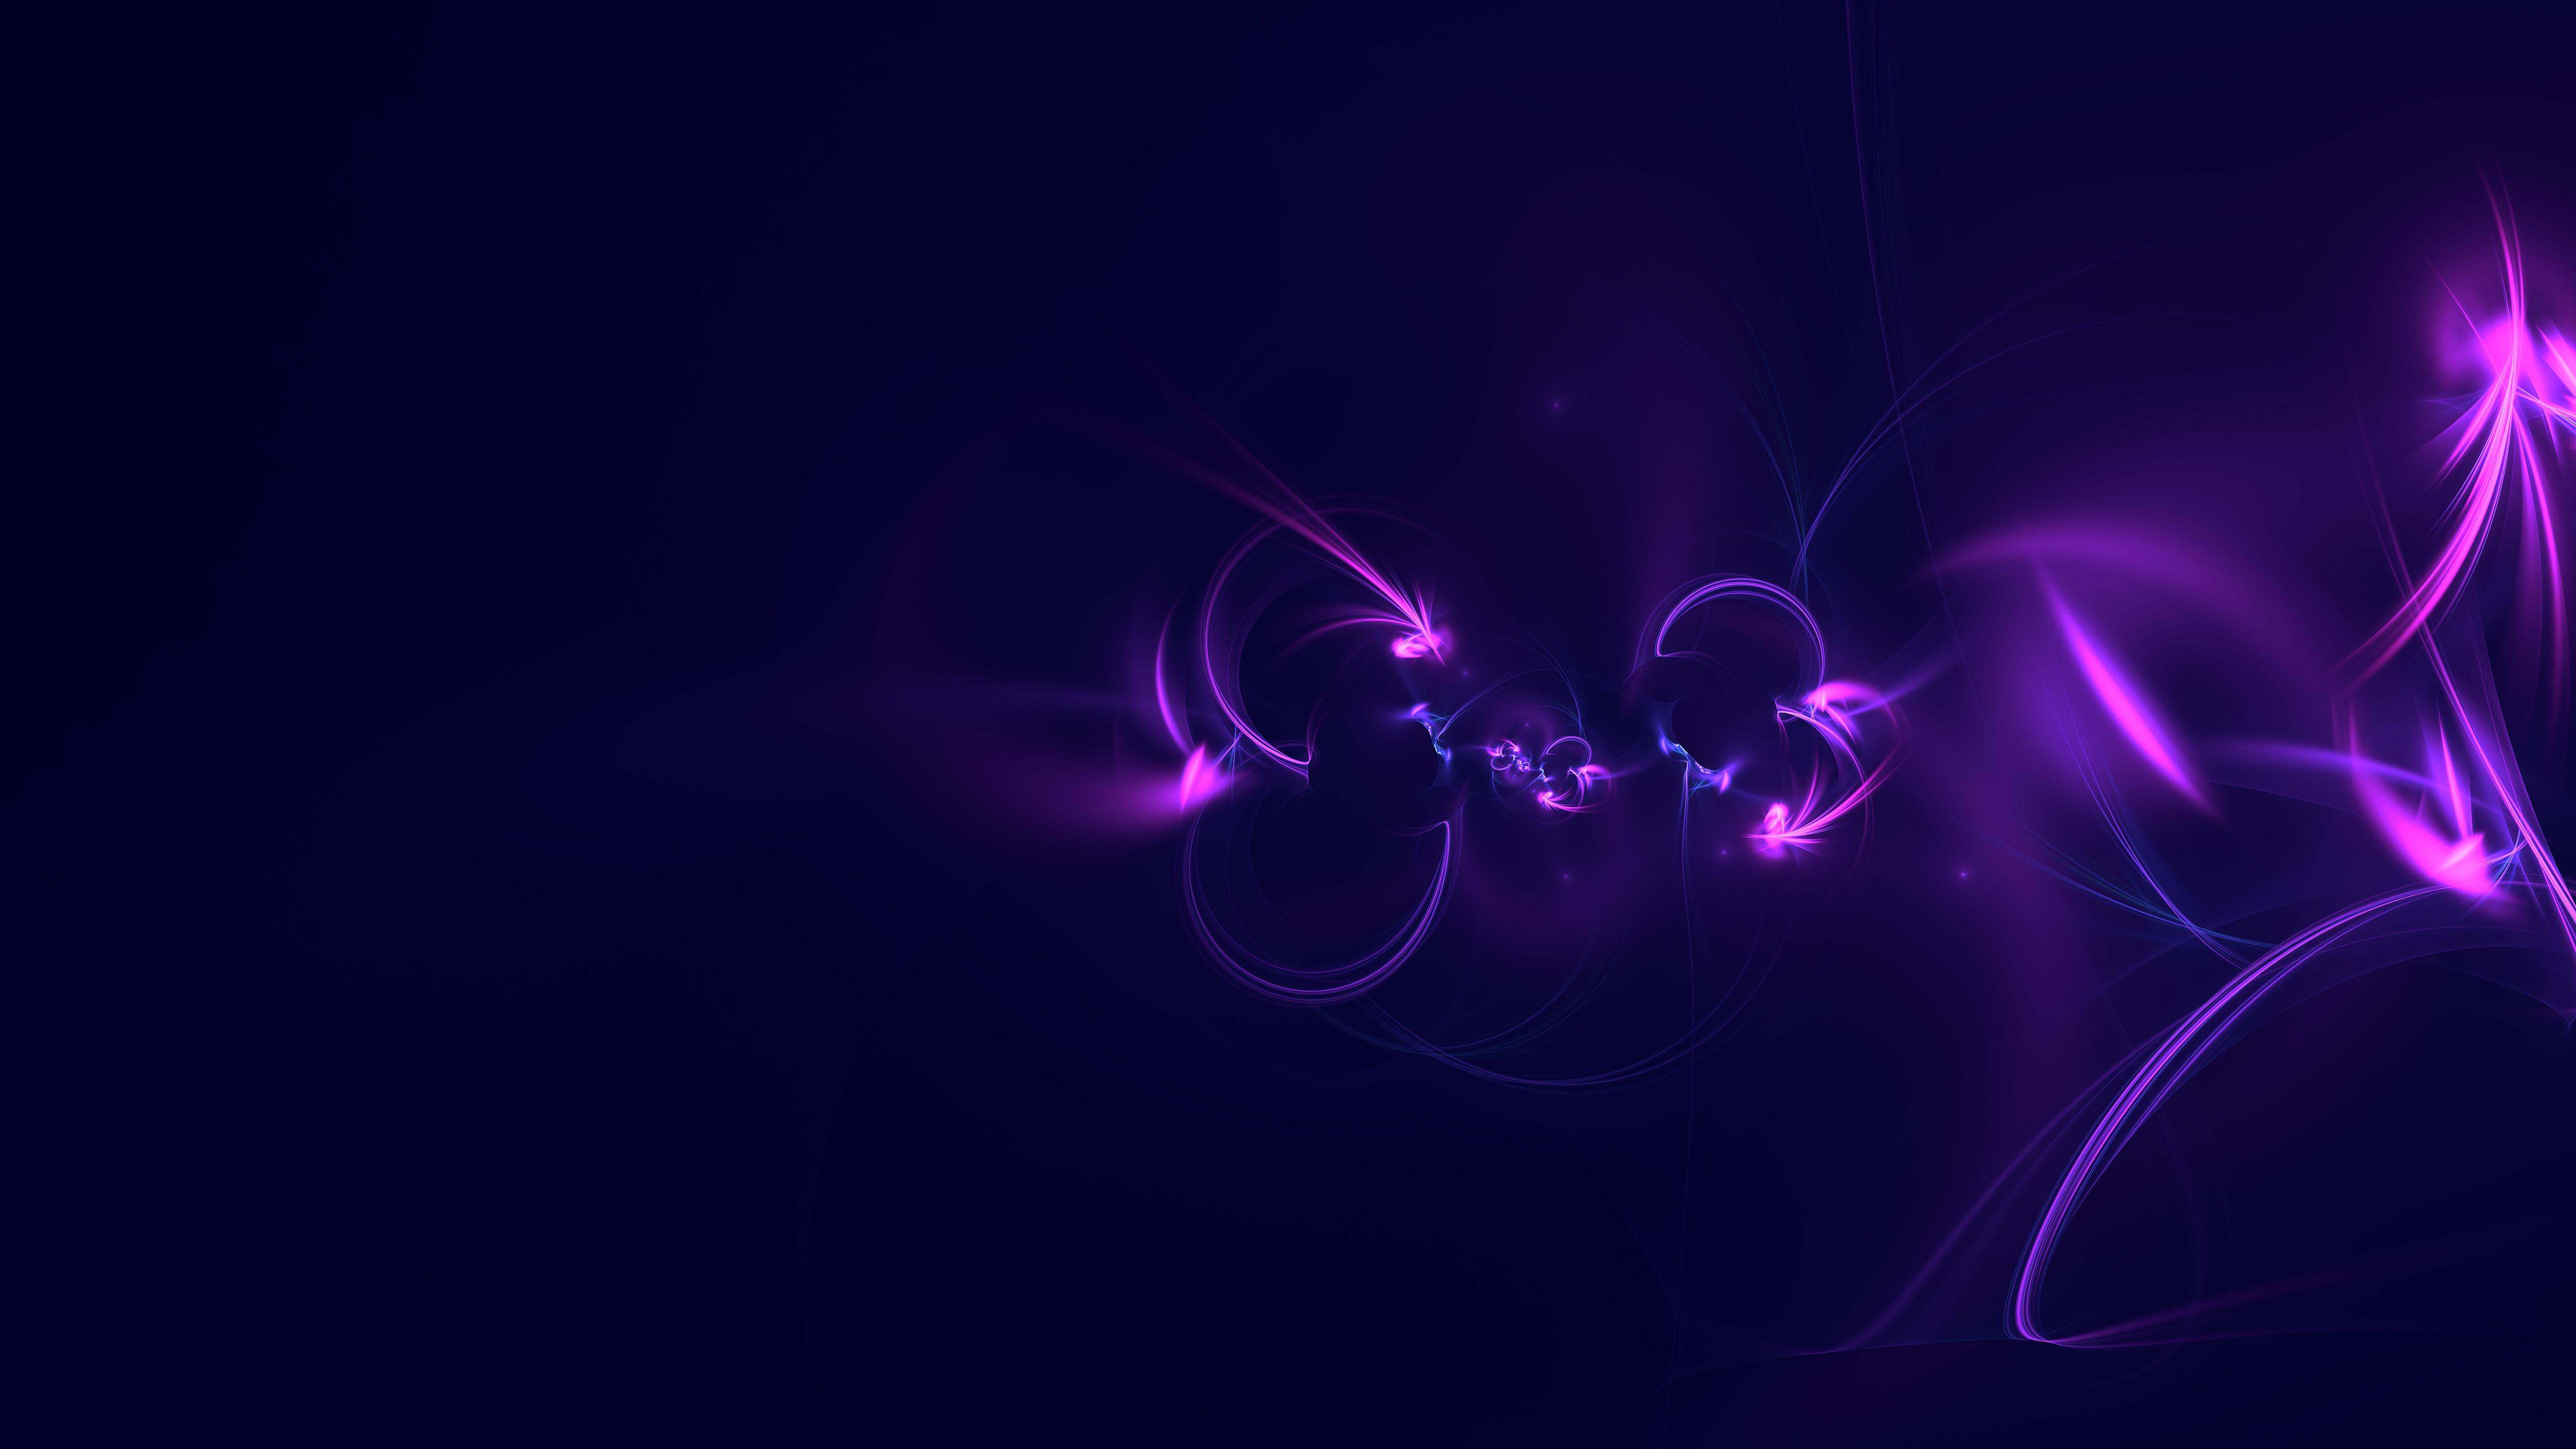 Abstract Digital Art Purple Background 5k